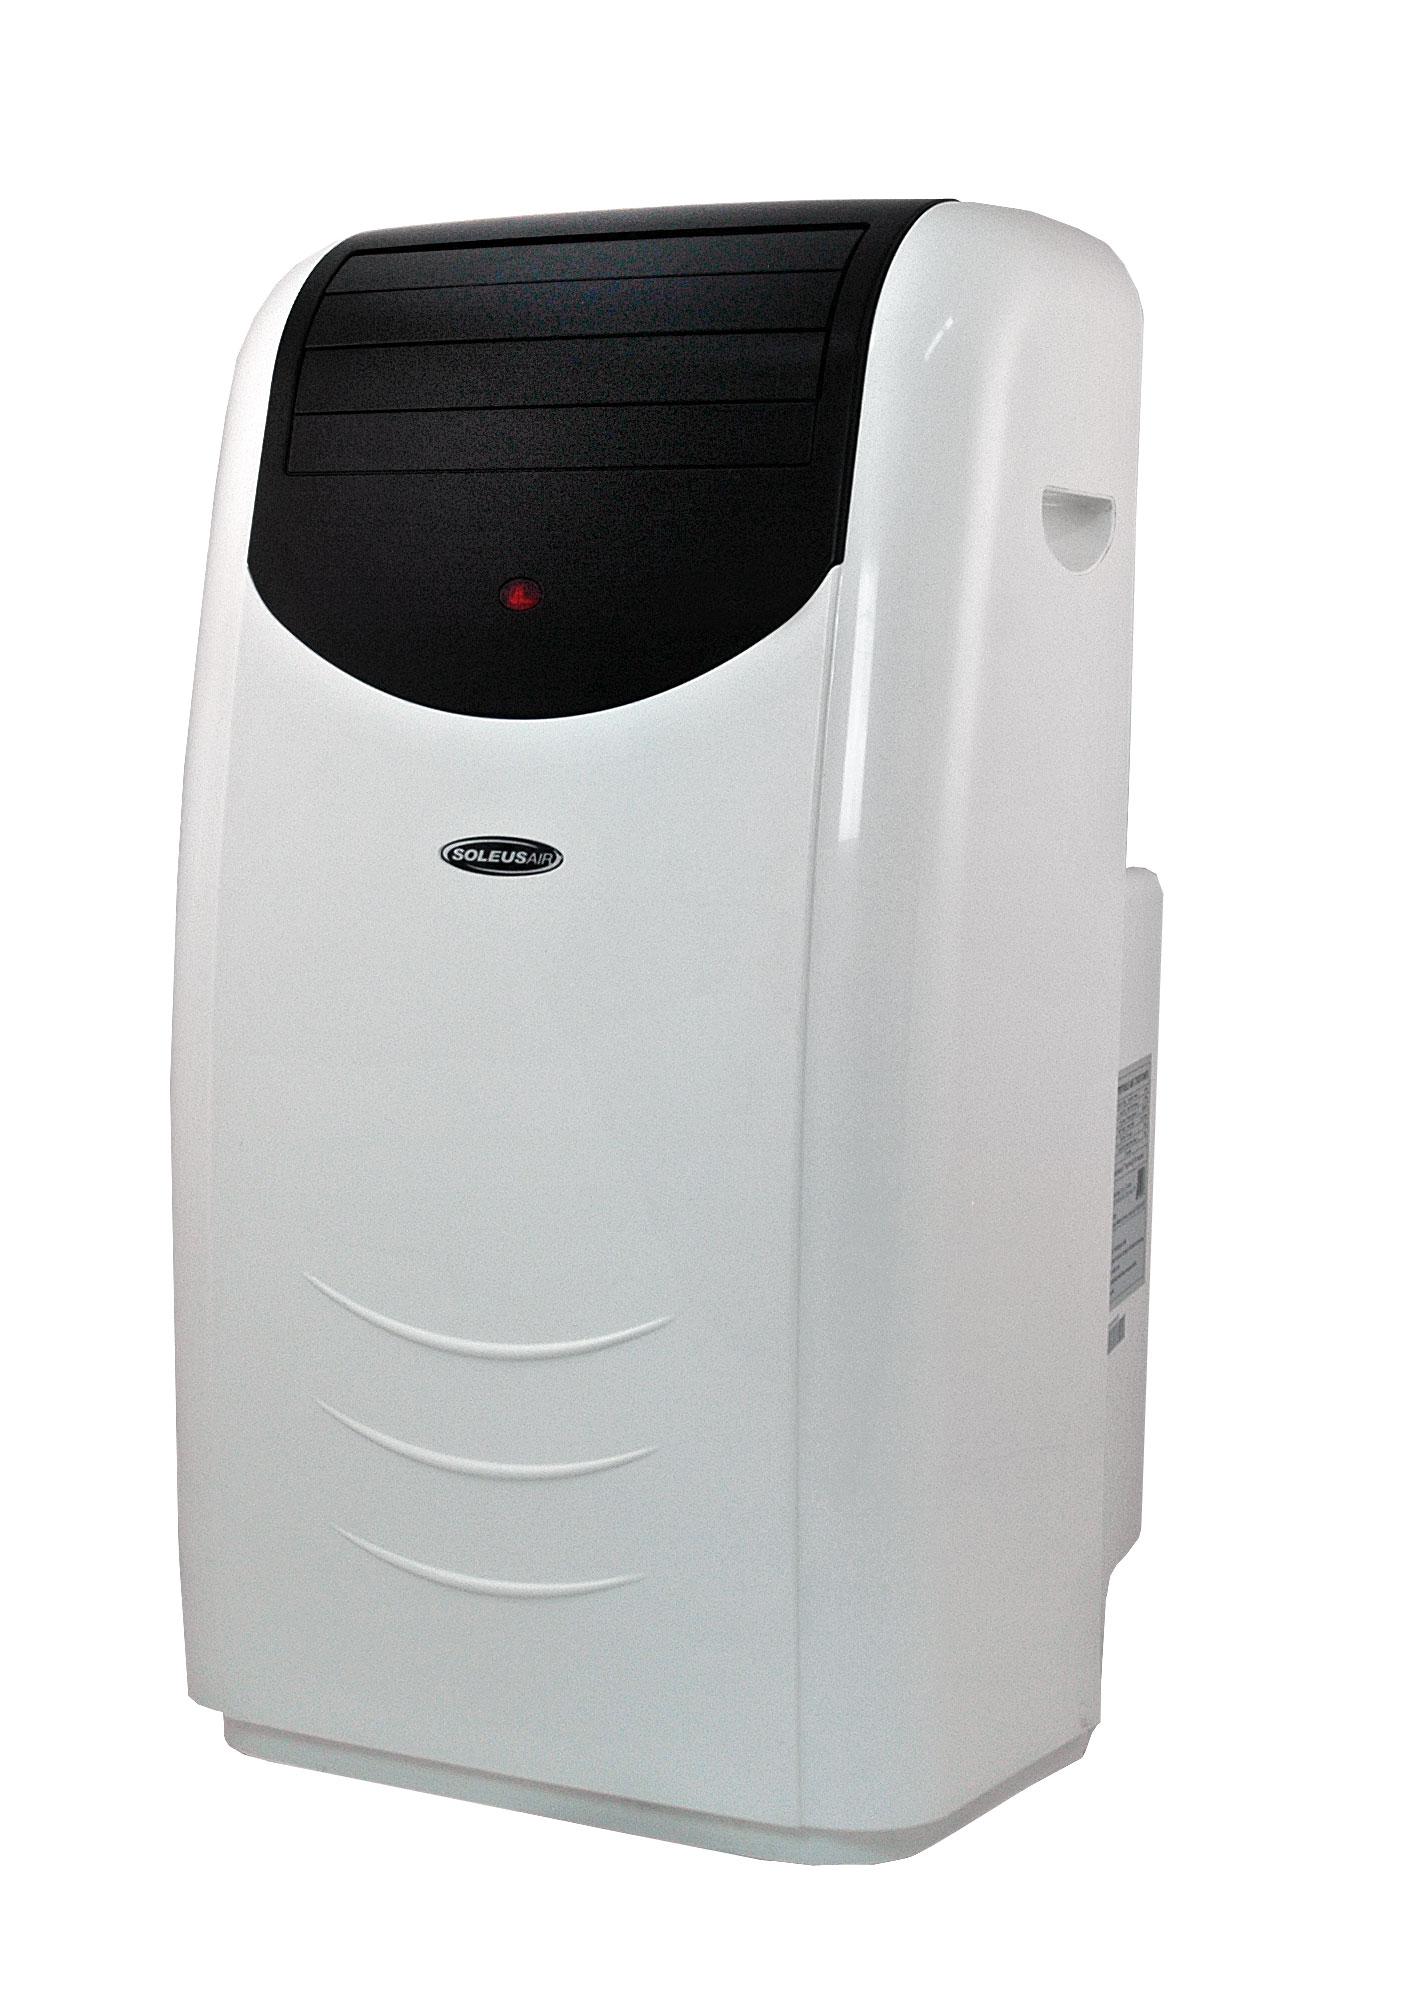 air conditioning walmart. soleus lx-140 14,000 btu portable evaporative air conditioner conditioning walmart